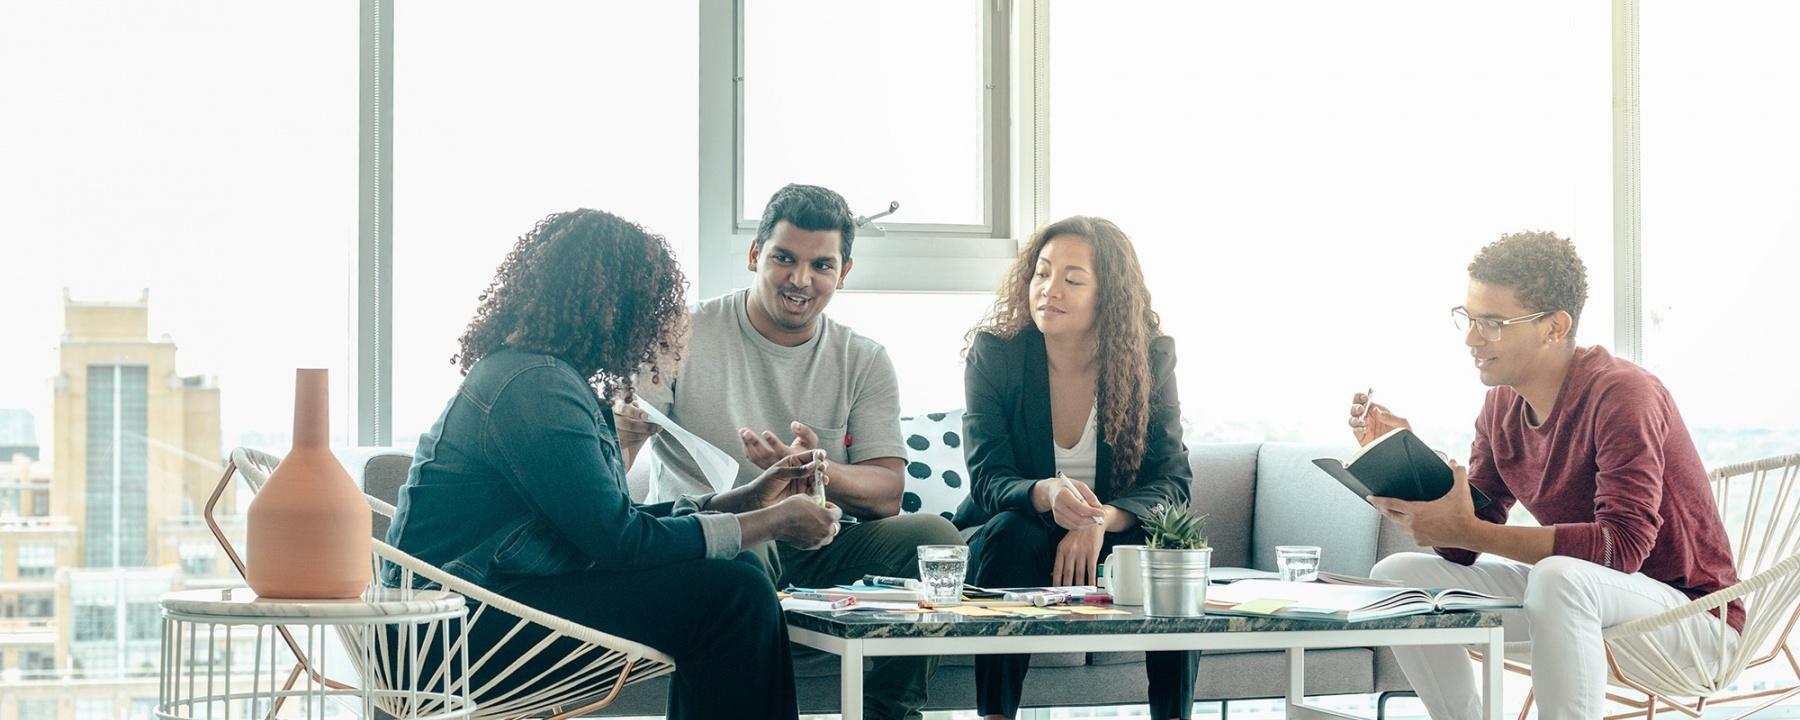 Team brainstorm meeting in bright sunny office 1